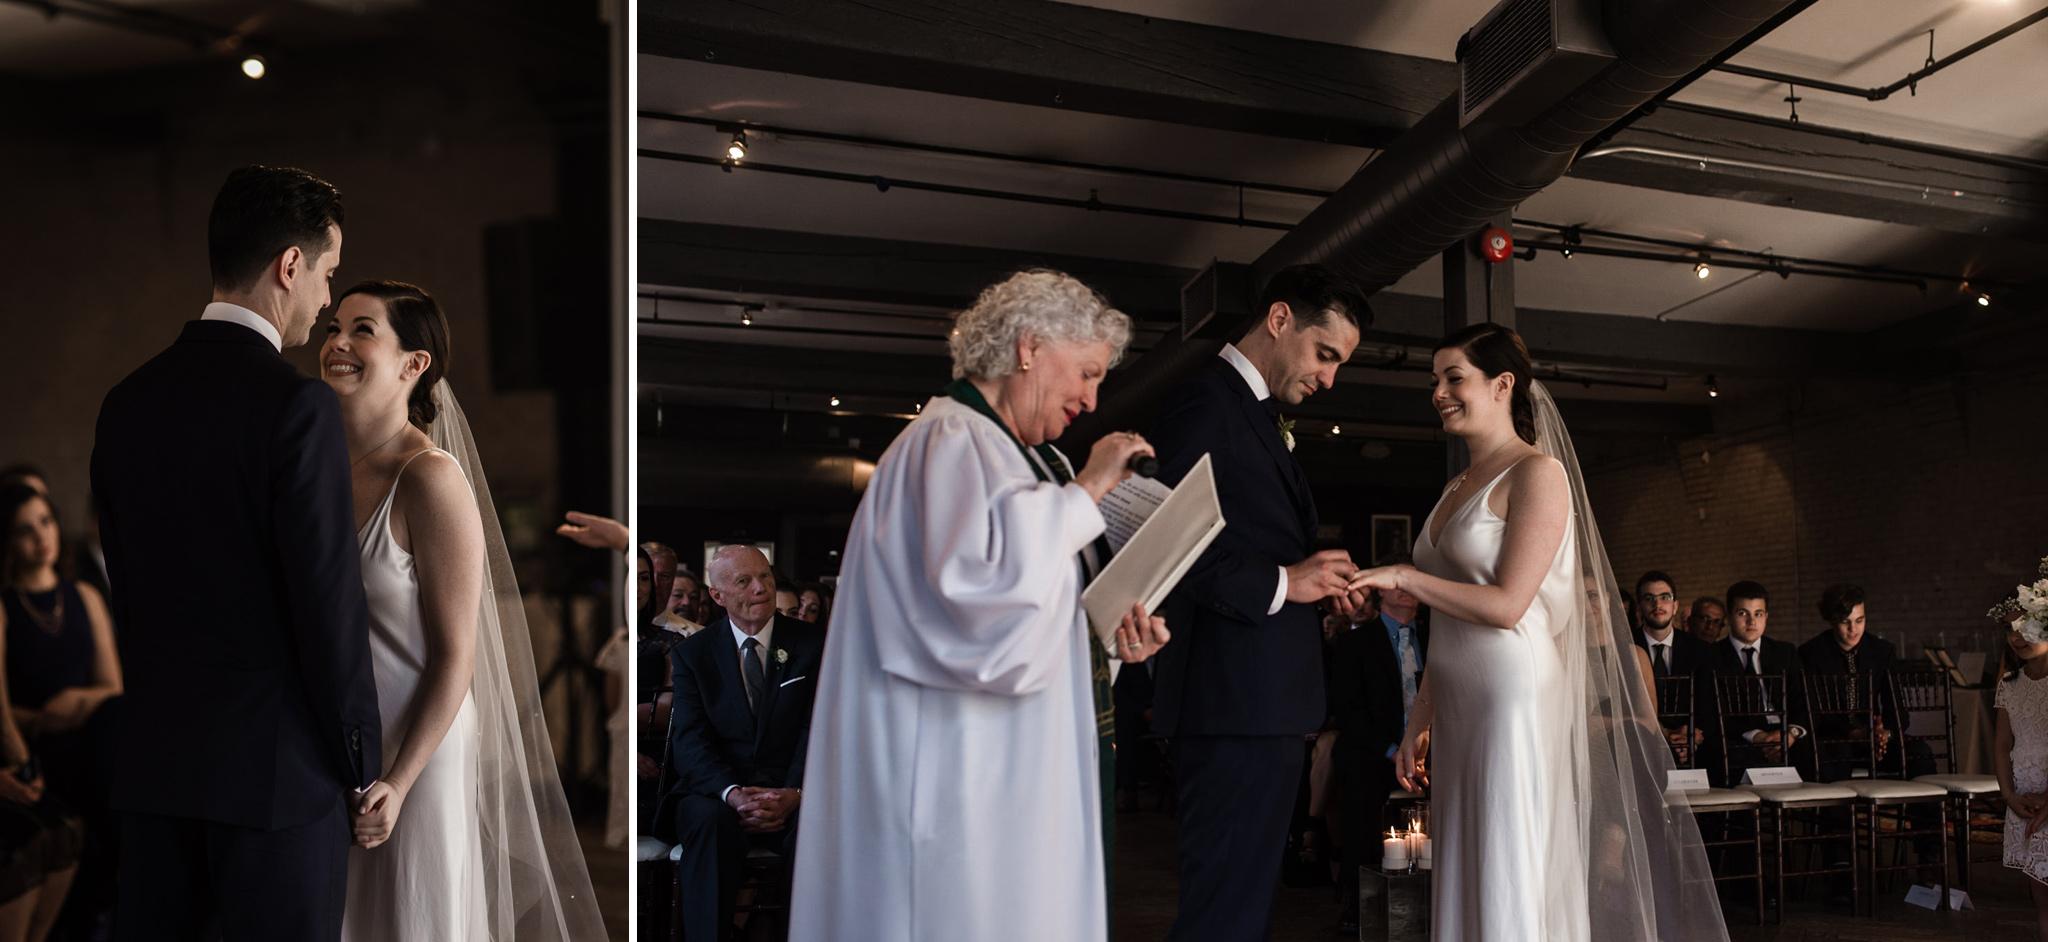 101-wedding-ceremony-storys-building-toronto-photographer-documentary.jpg